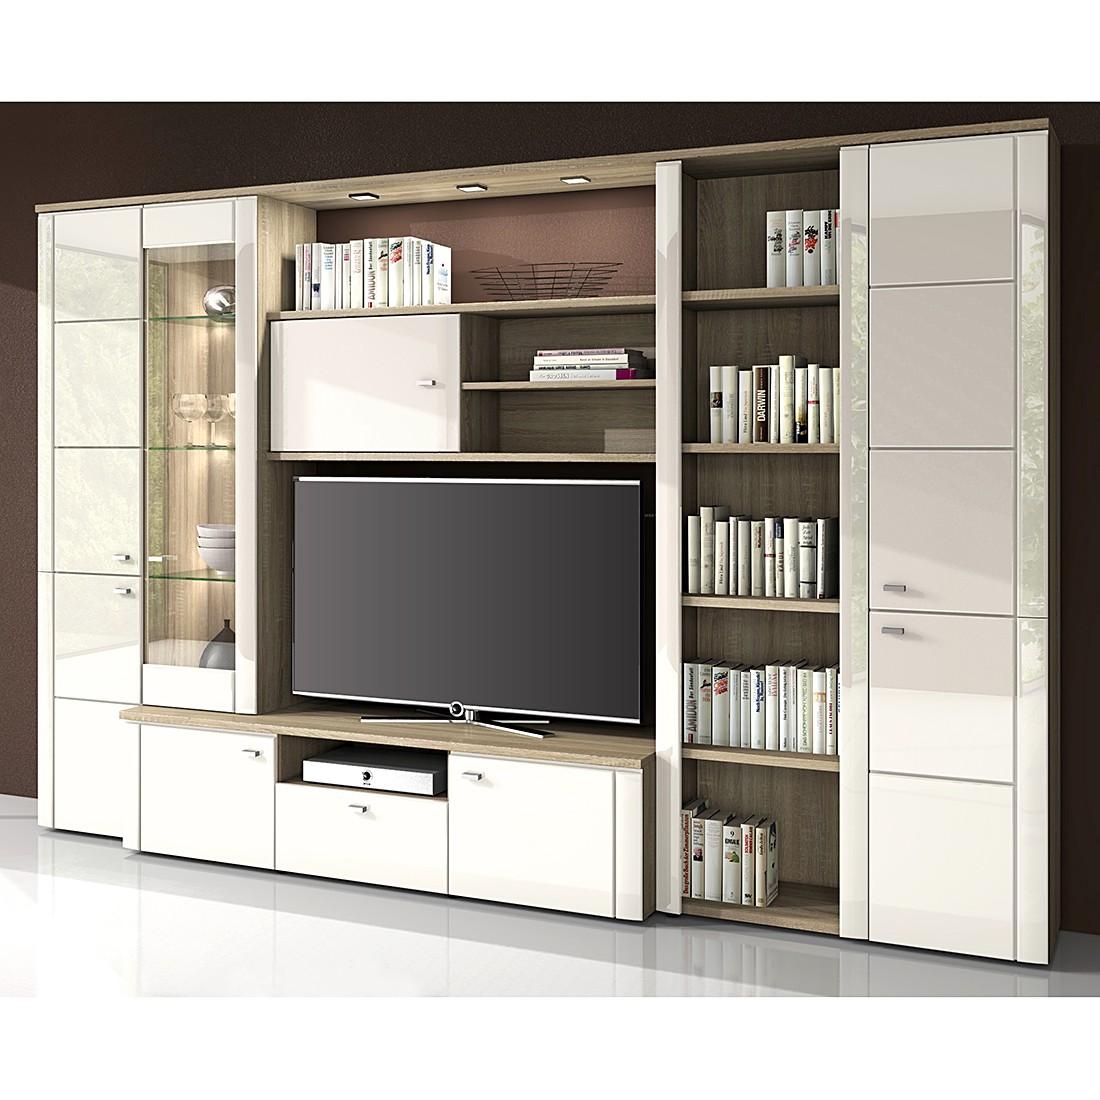 wohnwand merida i hochglanz wei ohne beleuchtung. Black Bedroom Furniture Sets. Home Design Ideas